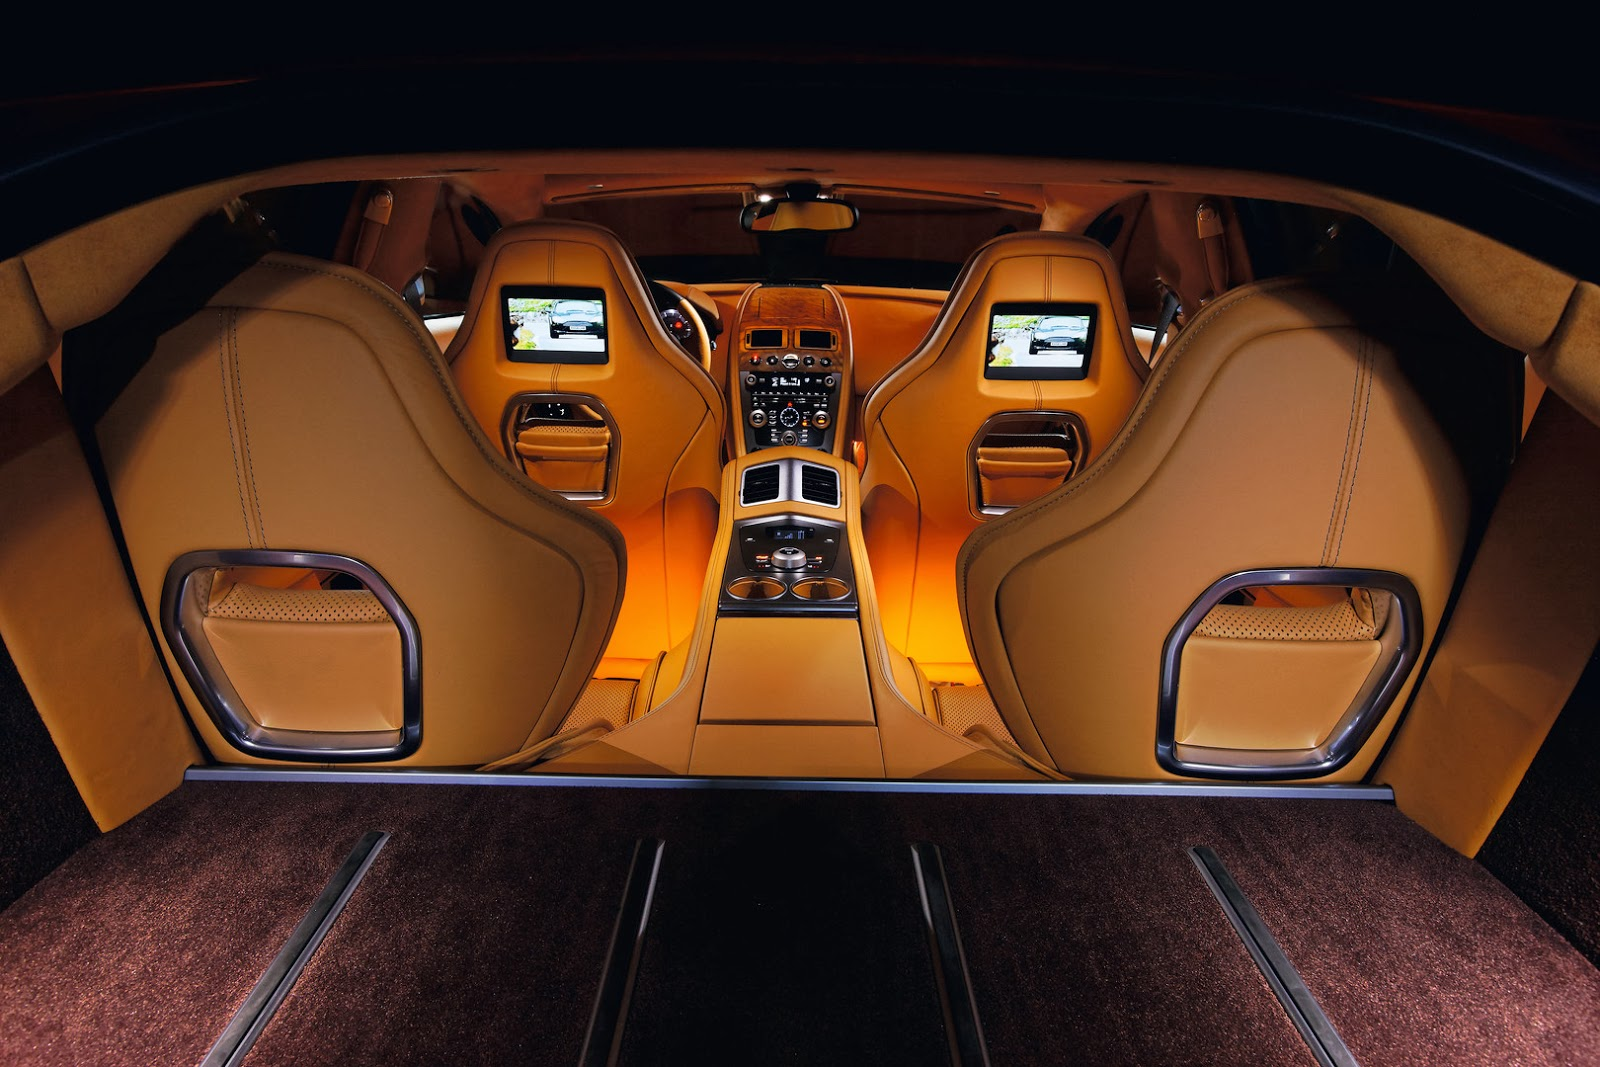 mitsubishi xpander vs pajero sport with Memilih Jok Mobil Harga Vs Kualitas on Mobil Hatchback as well 38808 further Video Xpander Sport A T further Nova L200 Triton 2017 Preco E Ficha as well 2018 Mitsubishi Expander Review.